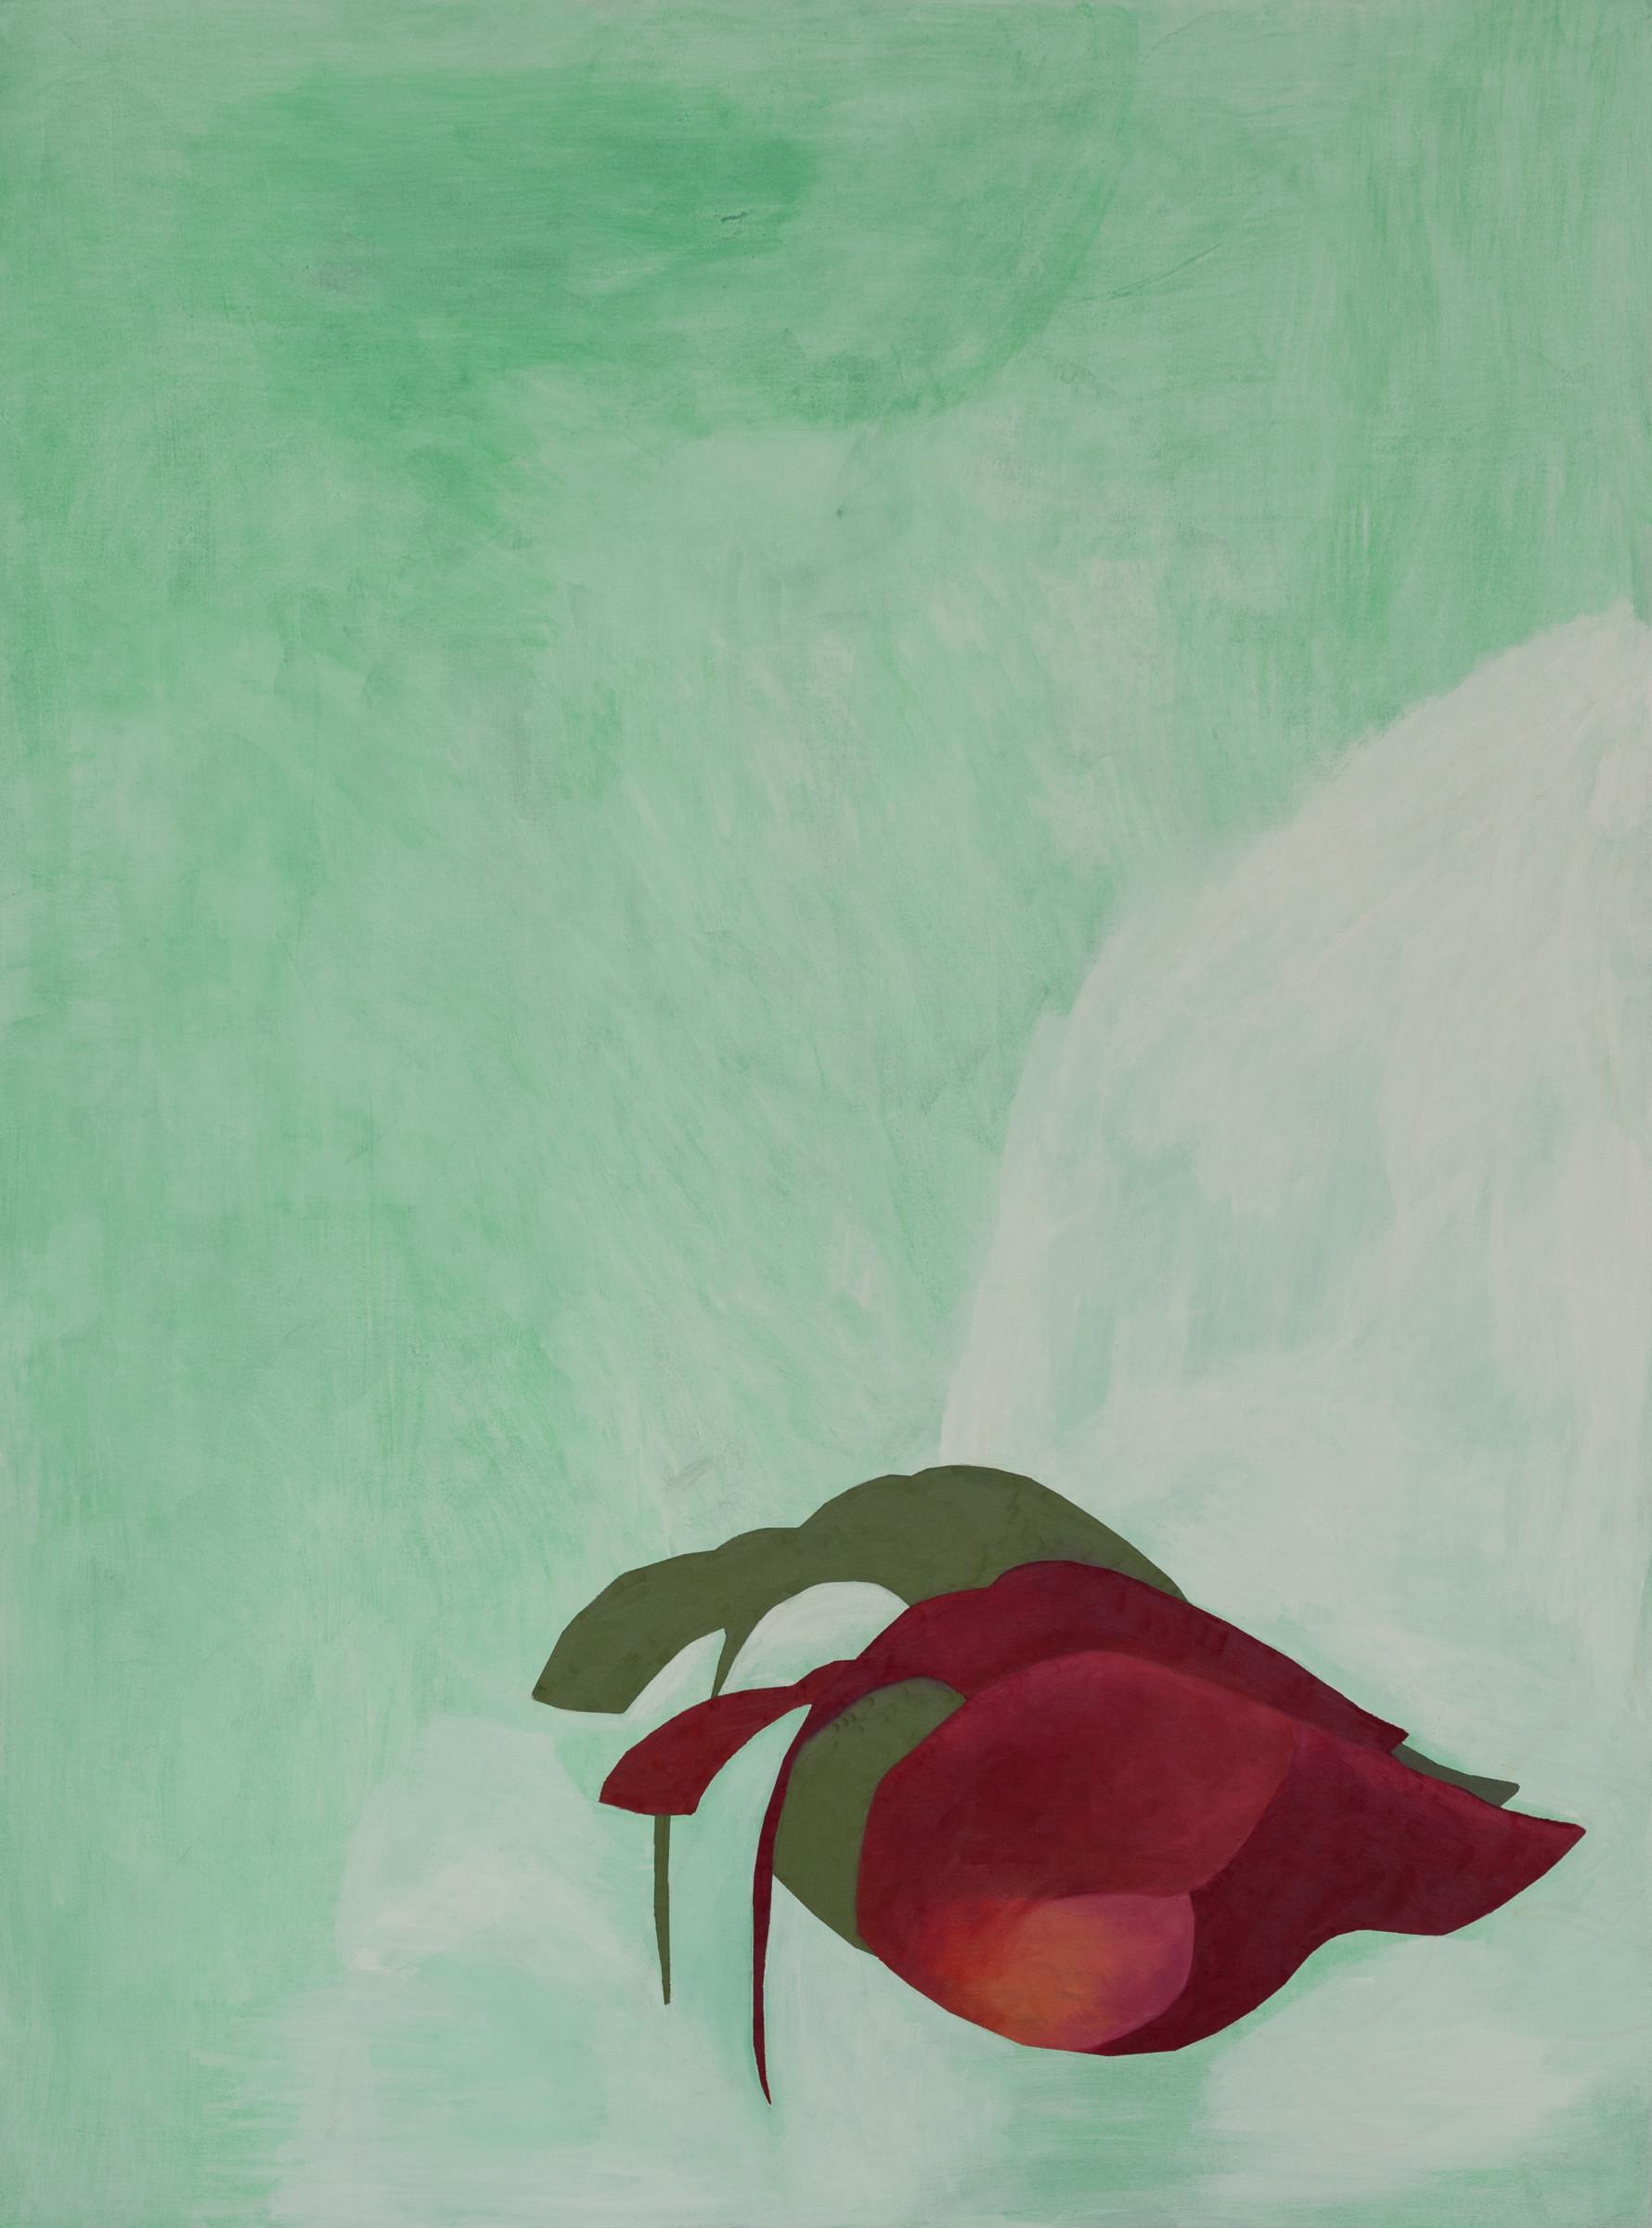 <span class=&#34;link fancybox-details-link&#34;><a href=&#34;/exhibitions/25/works/artworks5439/&#34;>View Detail Page</a></span><div class=&#34;medium&#34;>Oil sticks on canvas</div> <div class=&#34;dimensions&#34;>160 x 120 cm<br /> Unicum</div>